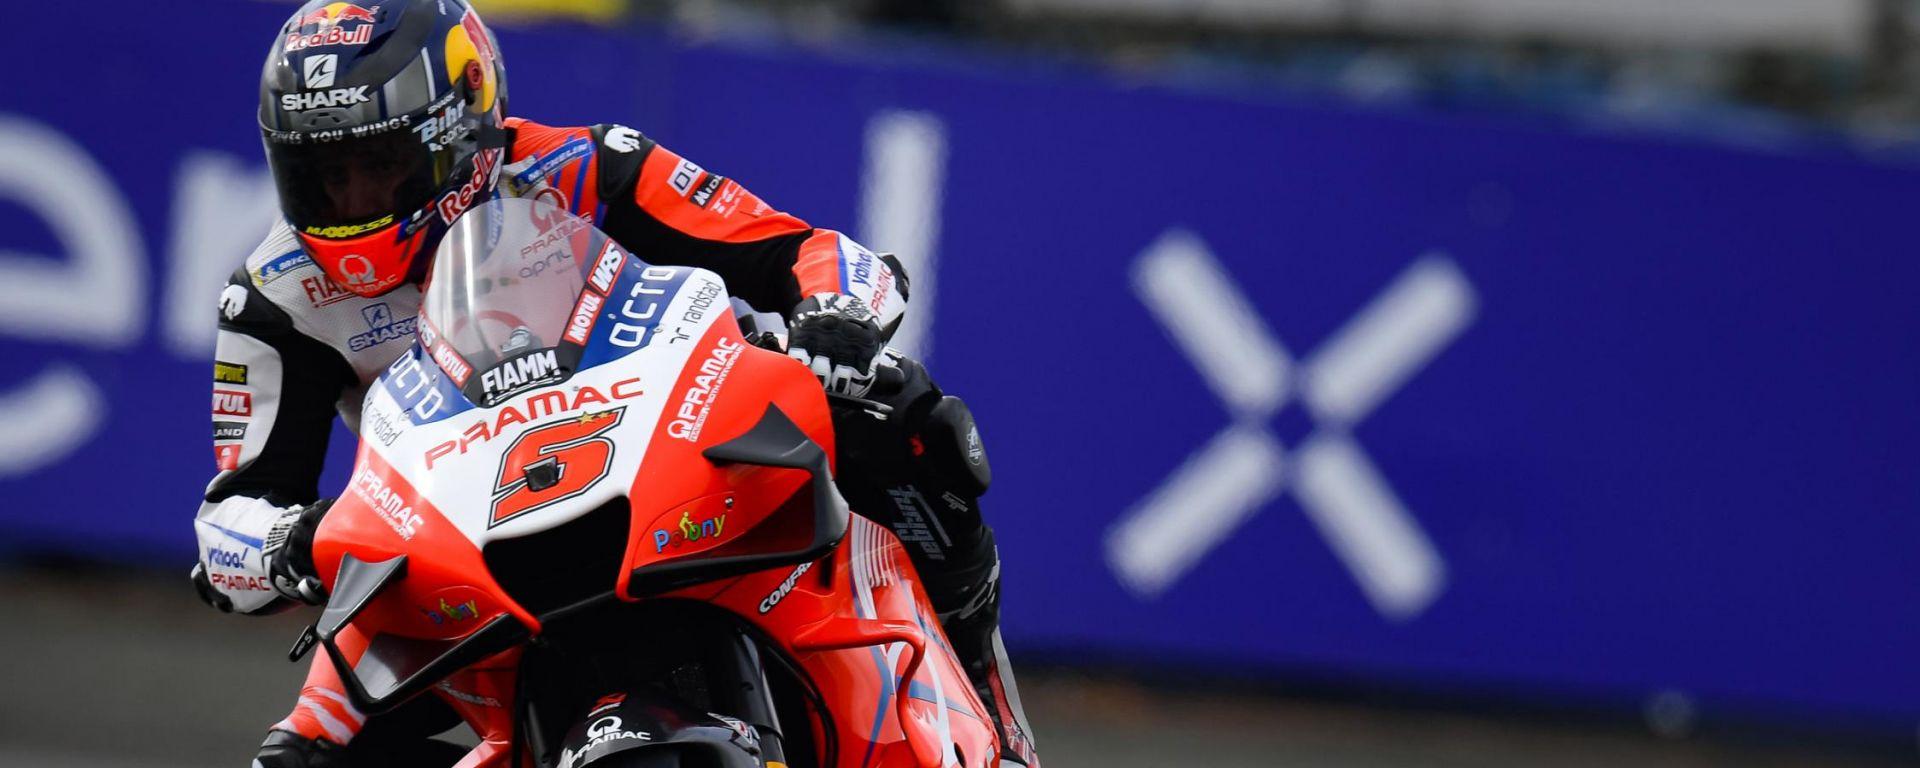 MotoGP Francia 2021, Le Mans: Johann Zarco (Ducati Pramac Racing)